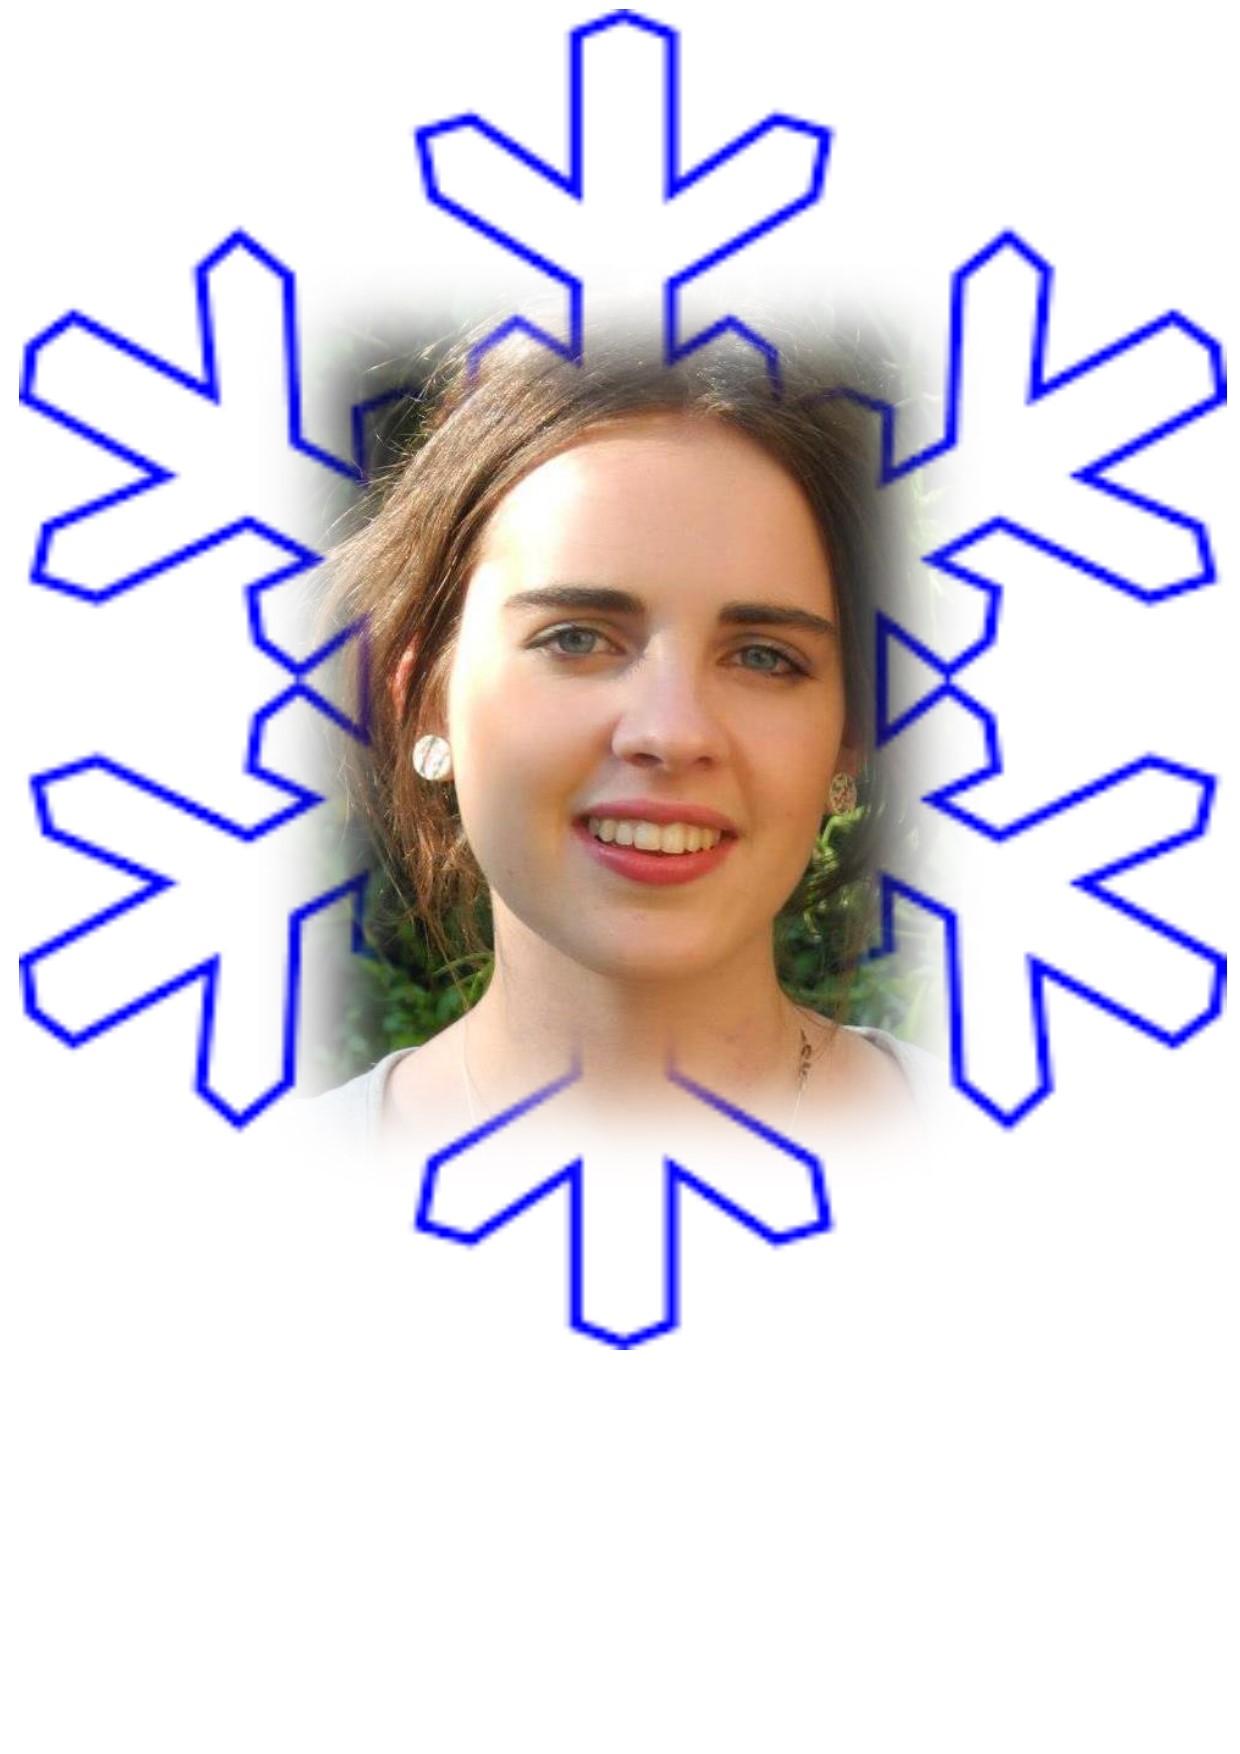 Fiona snowflake.jpg